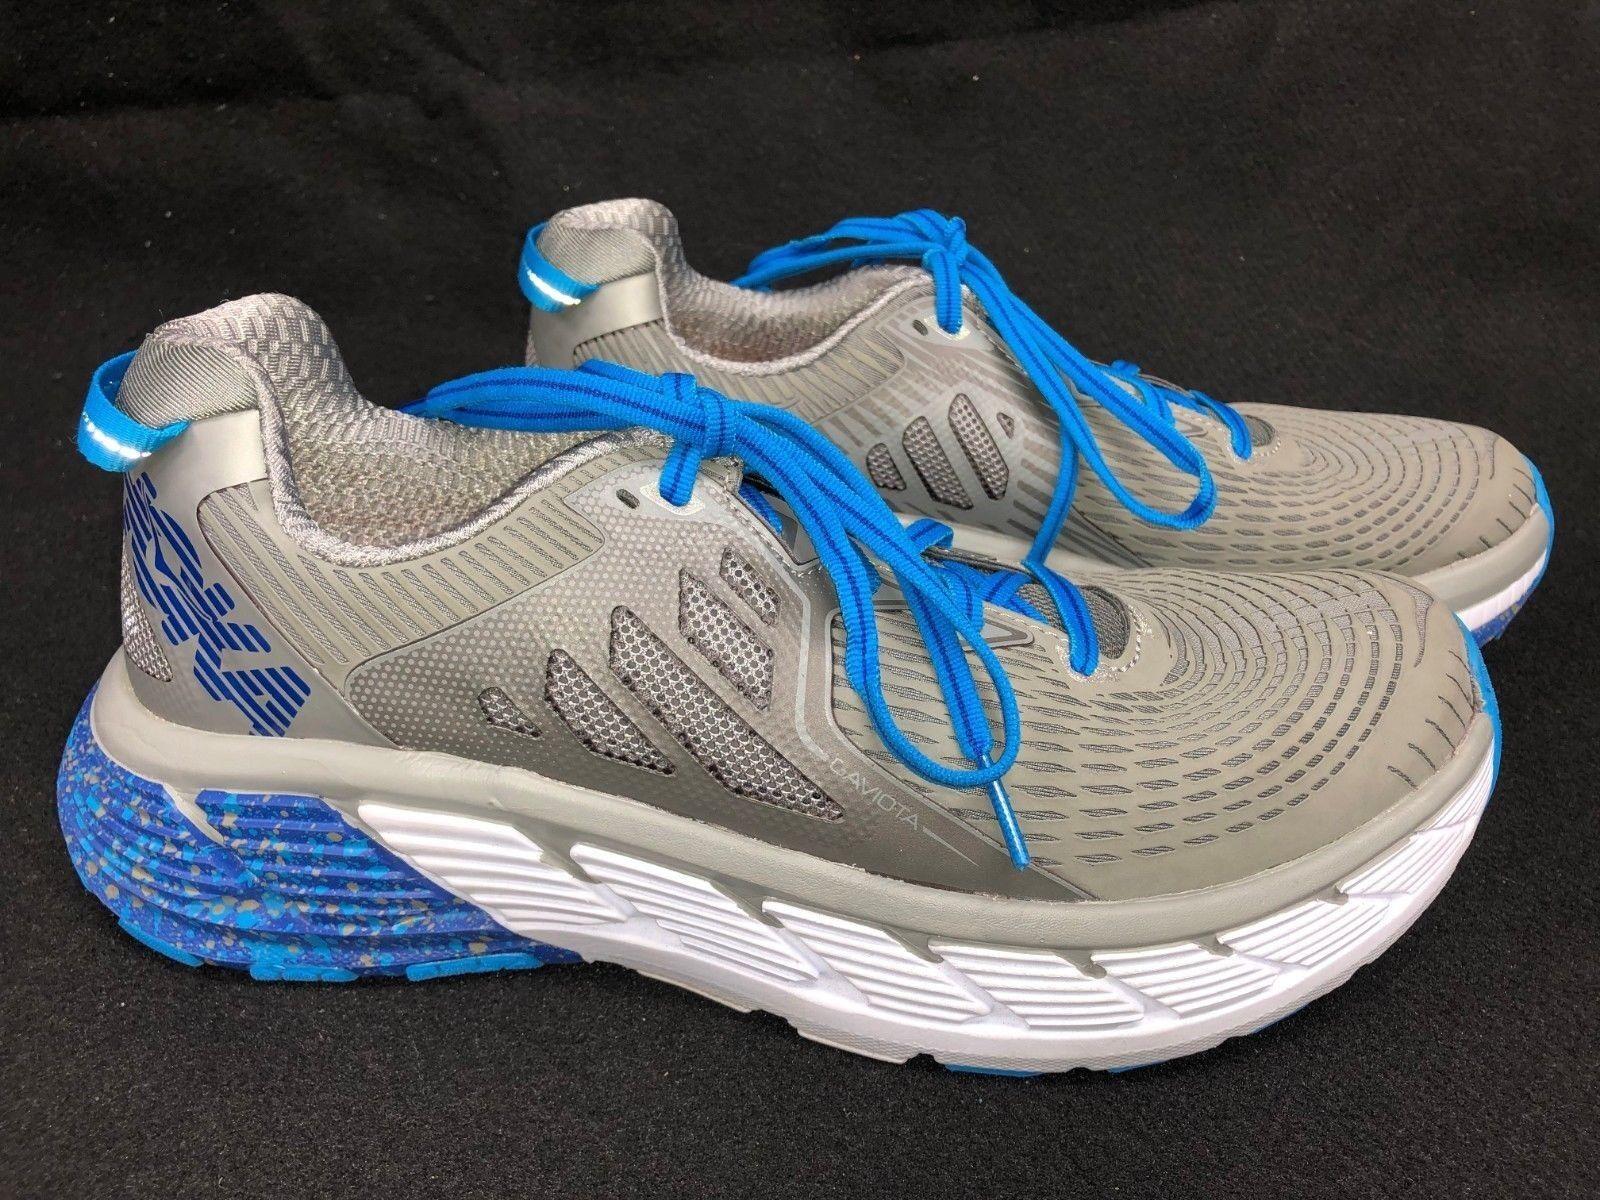 HOKA ONE ONE Gaviota Men's running tennis shoes Lace Up Wild Dove   True bluee